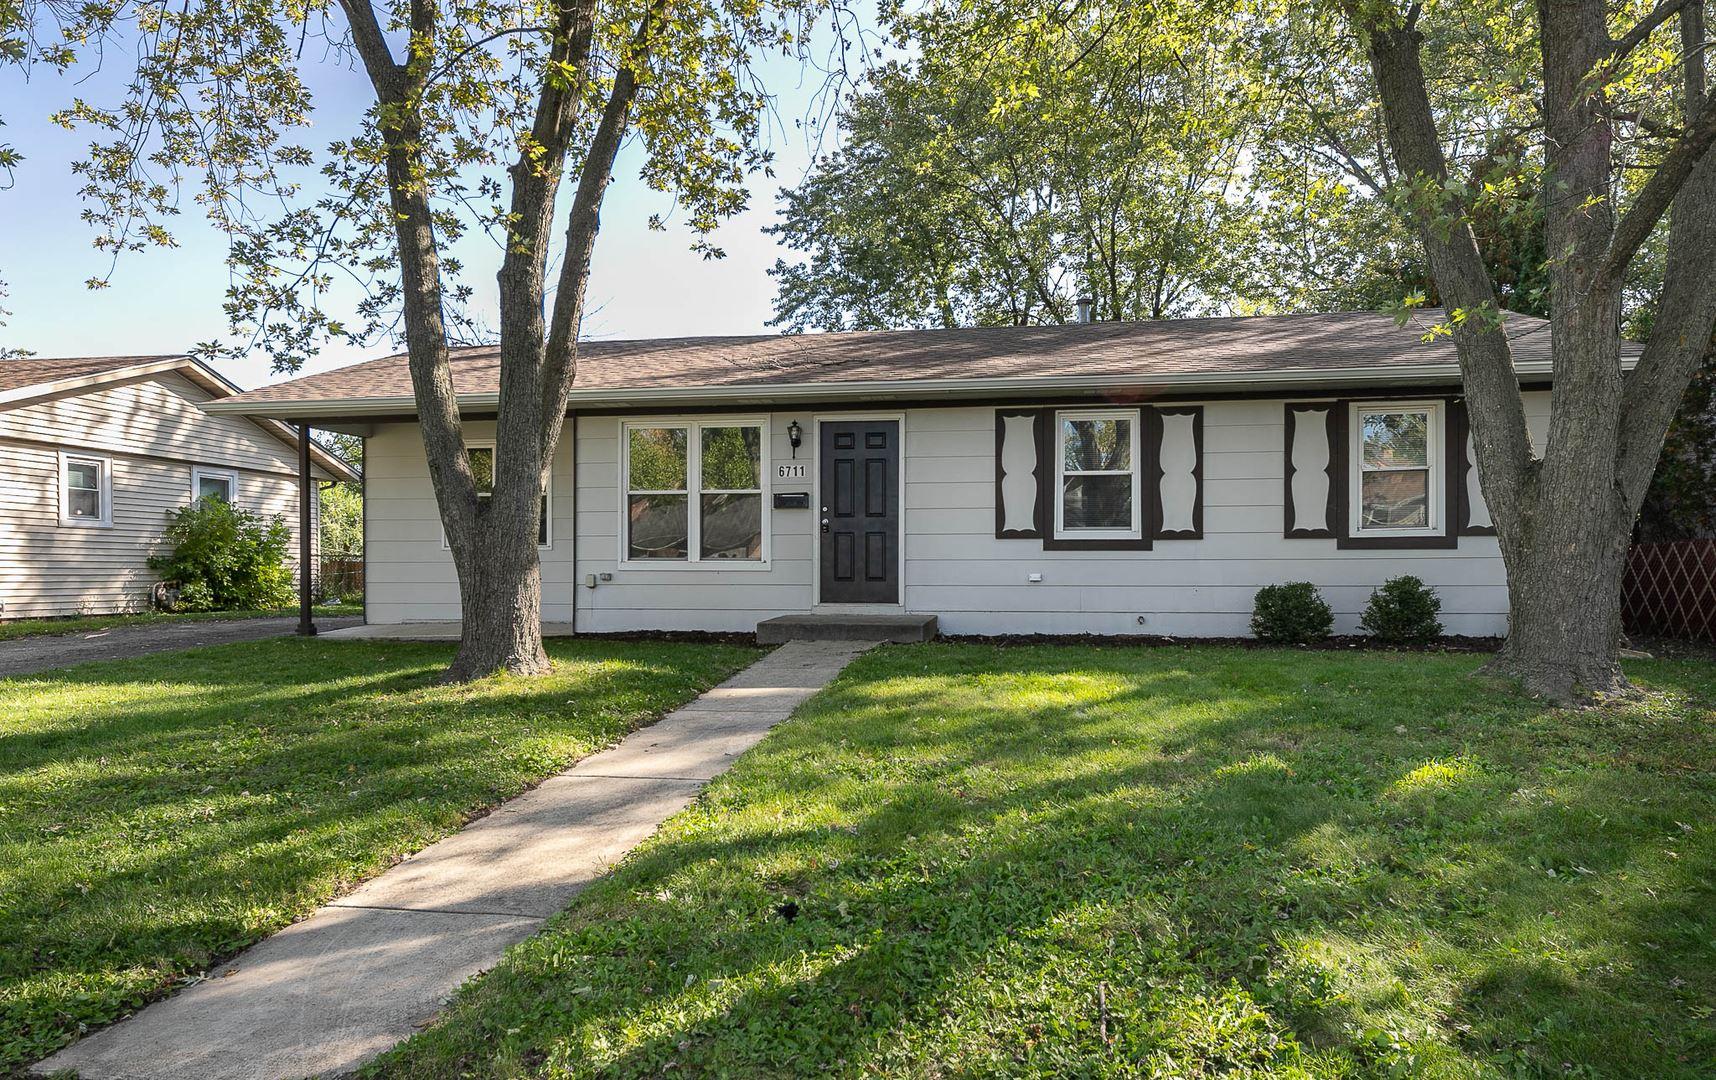 6711 Peach Tree Street, Hanover Park, IL 60133 - #: 10892829